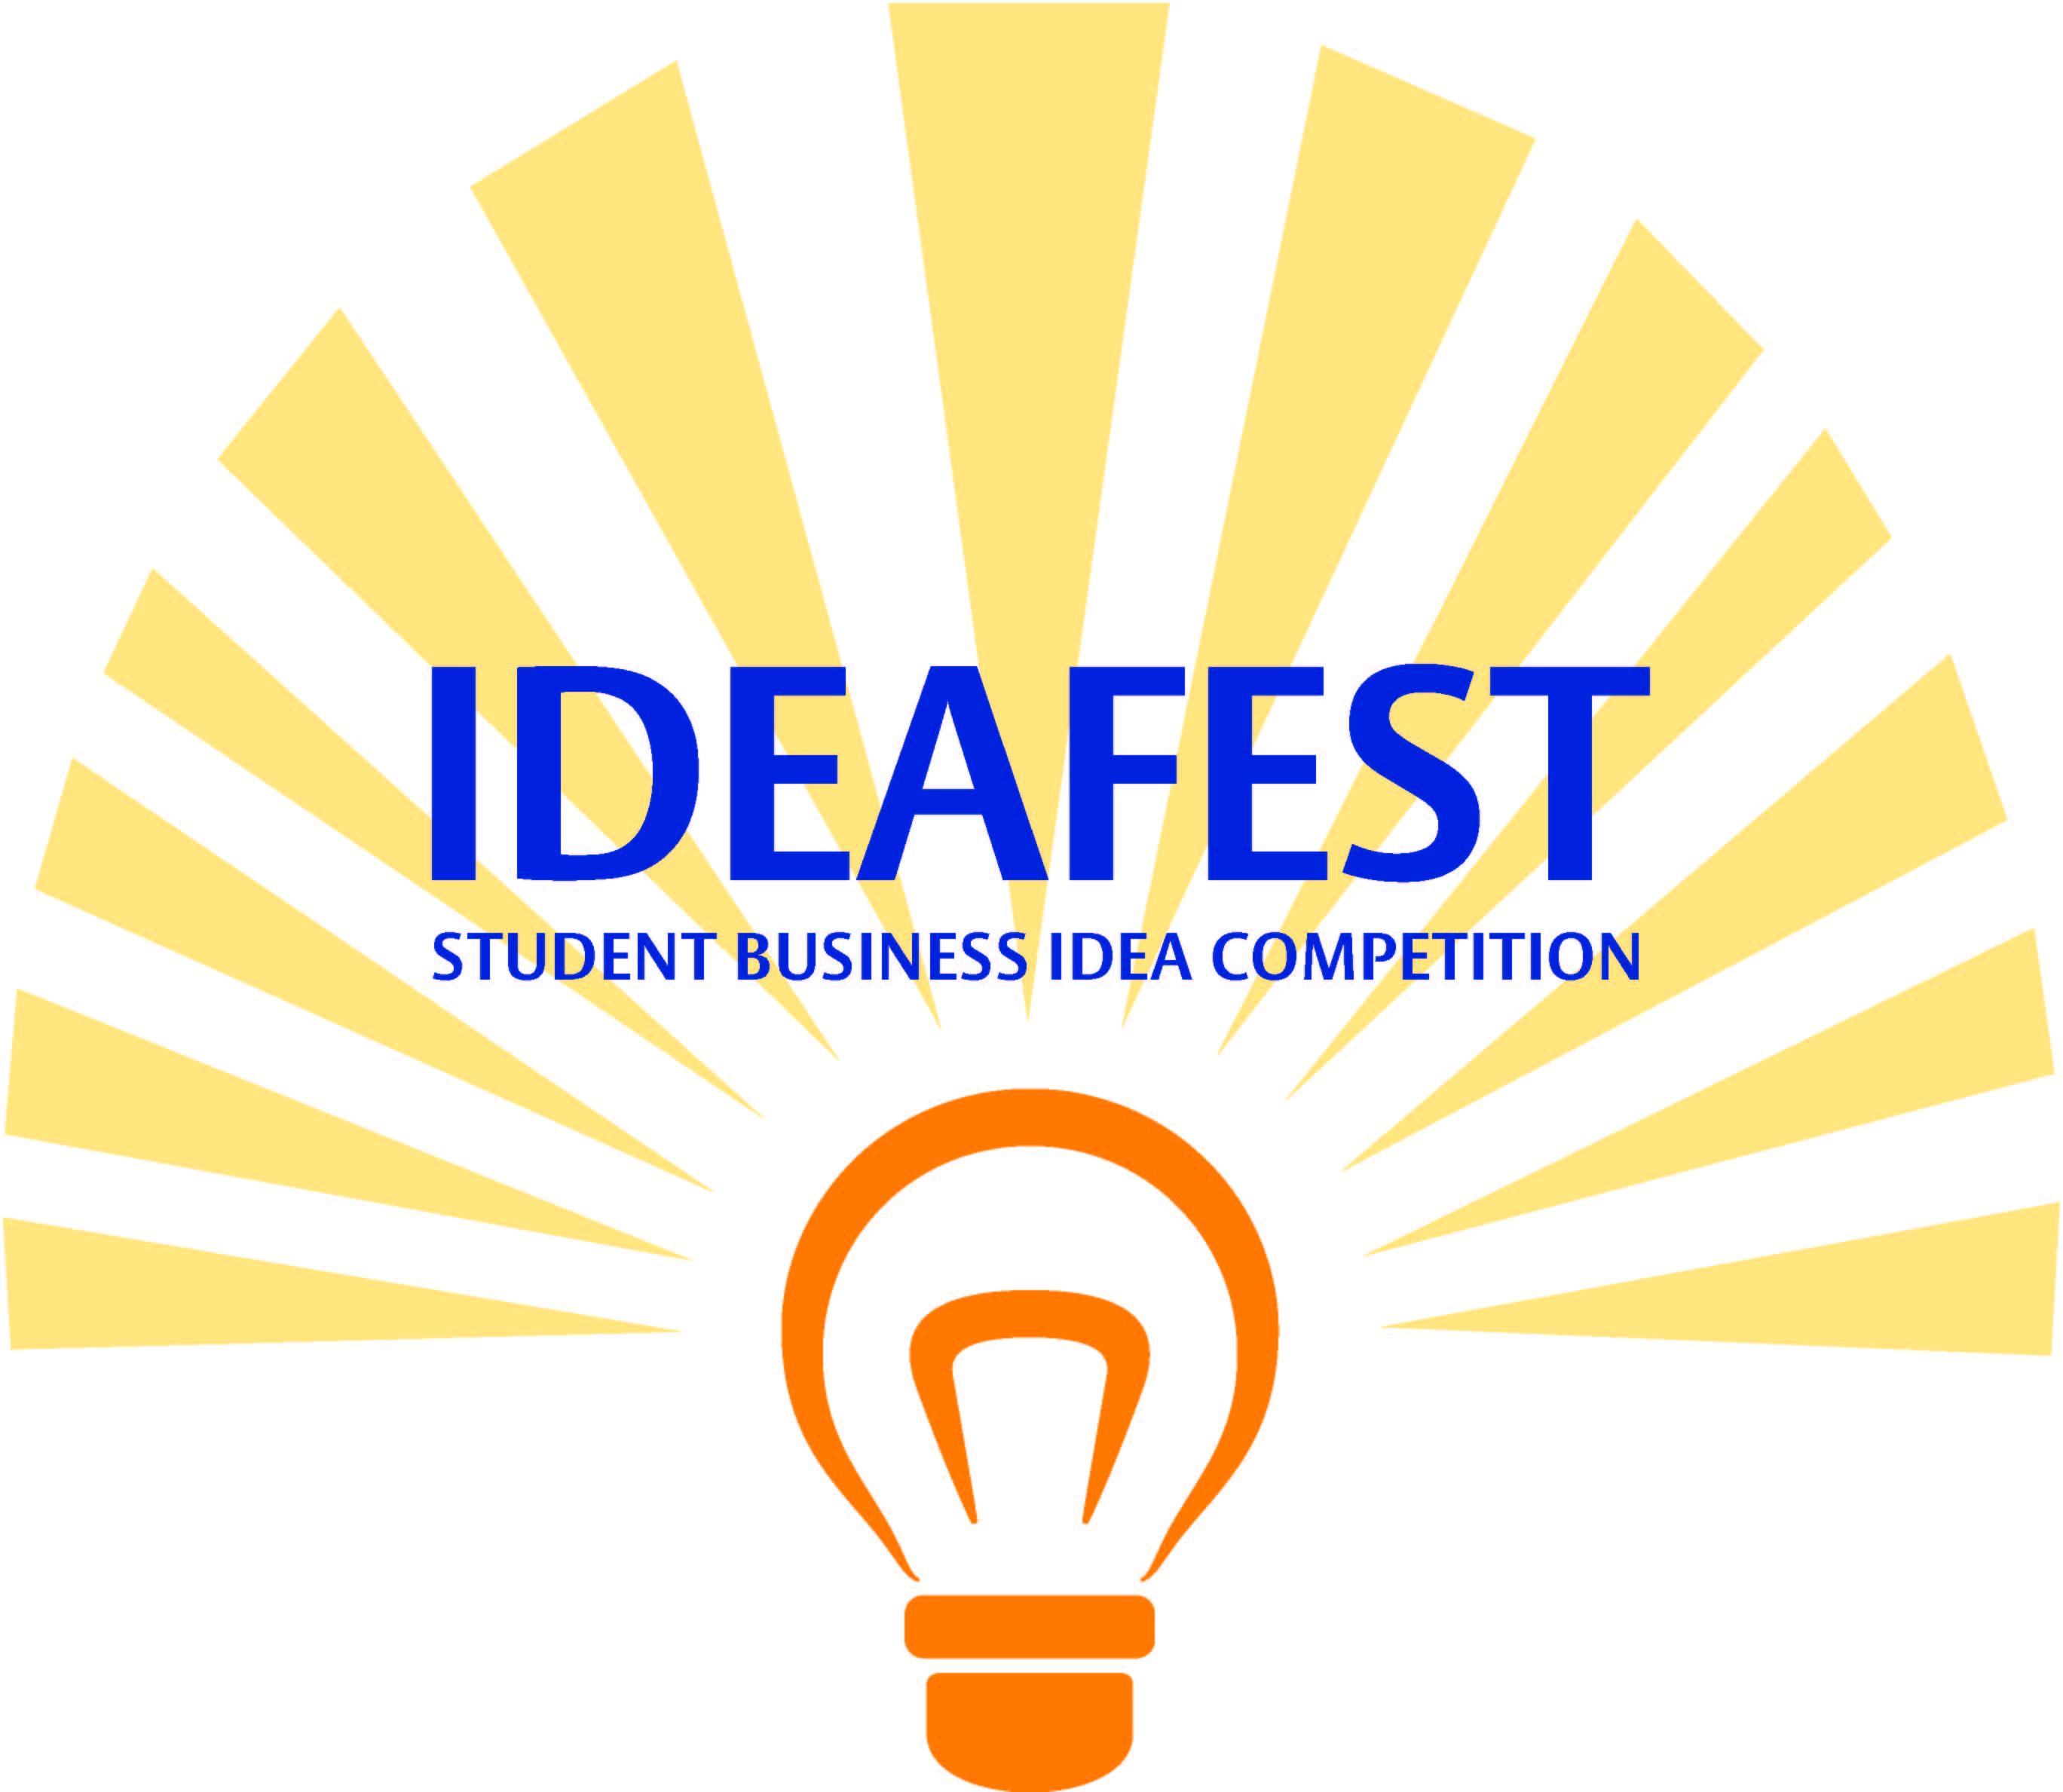 IDEAFEST Final 2020